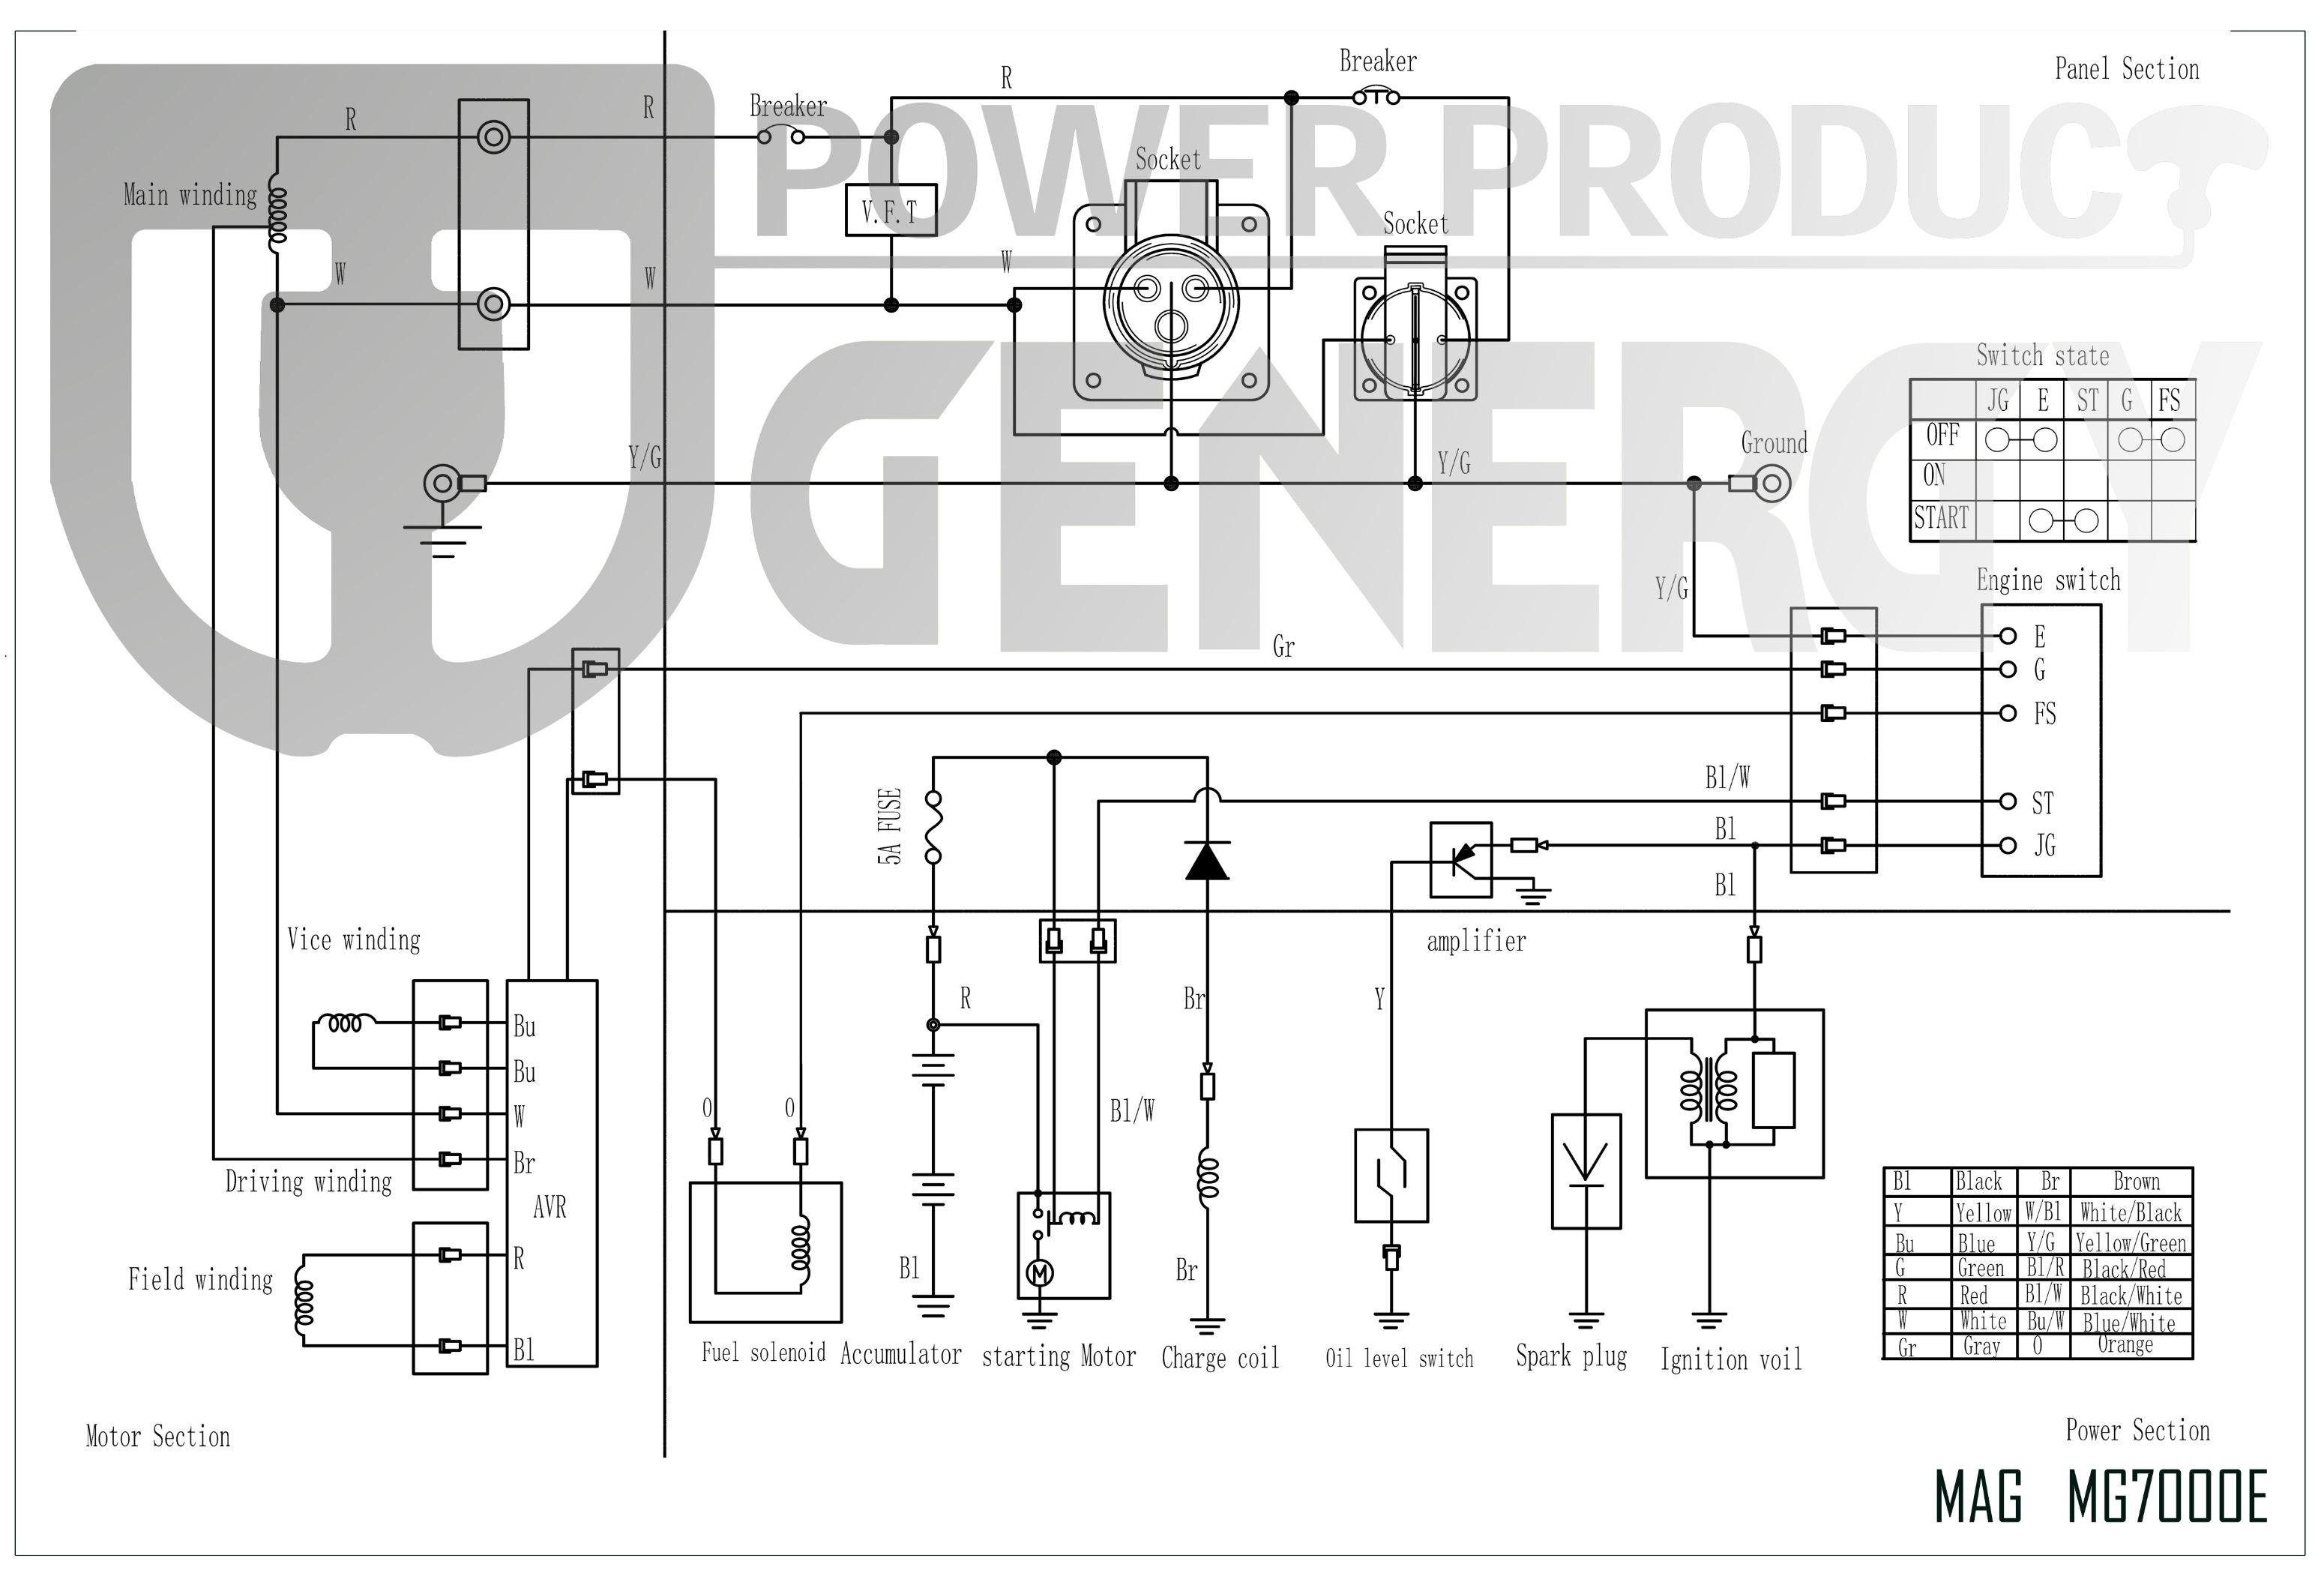 MG7000E Generator Diagram